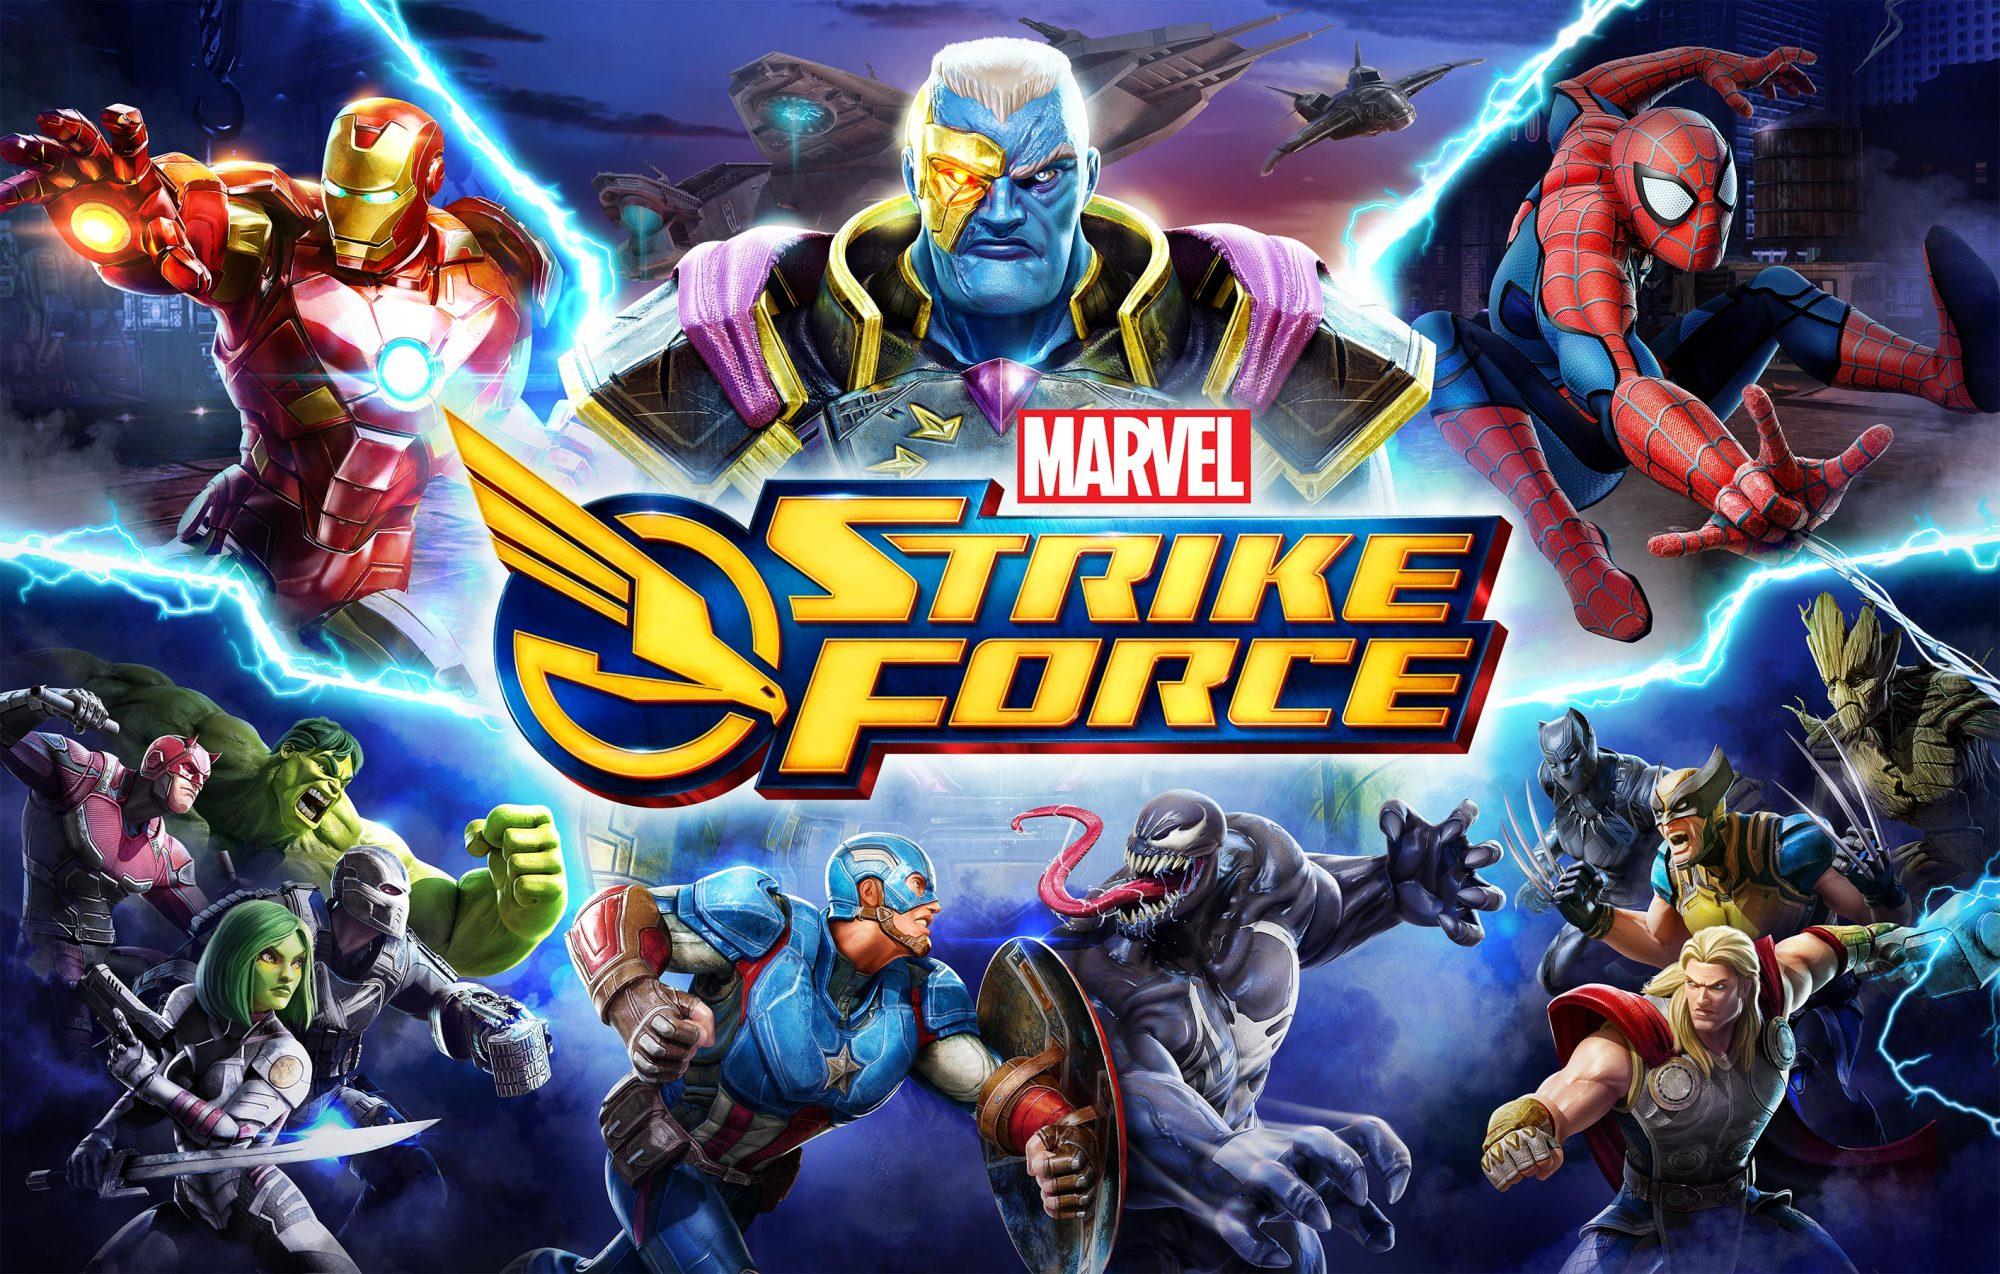 MARVEL Strike Force Key Art CR: Marvel/FoxNext